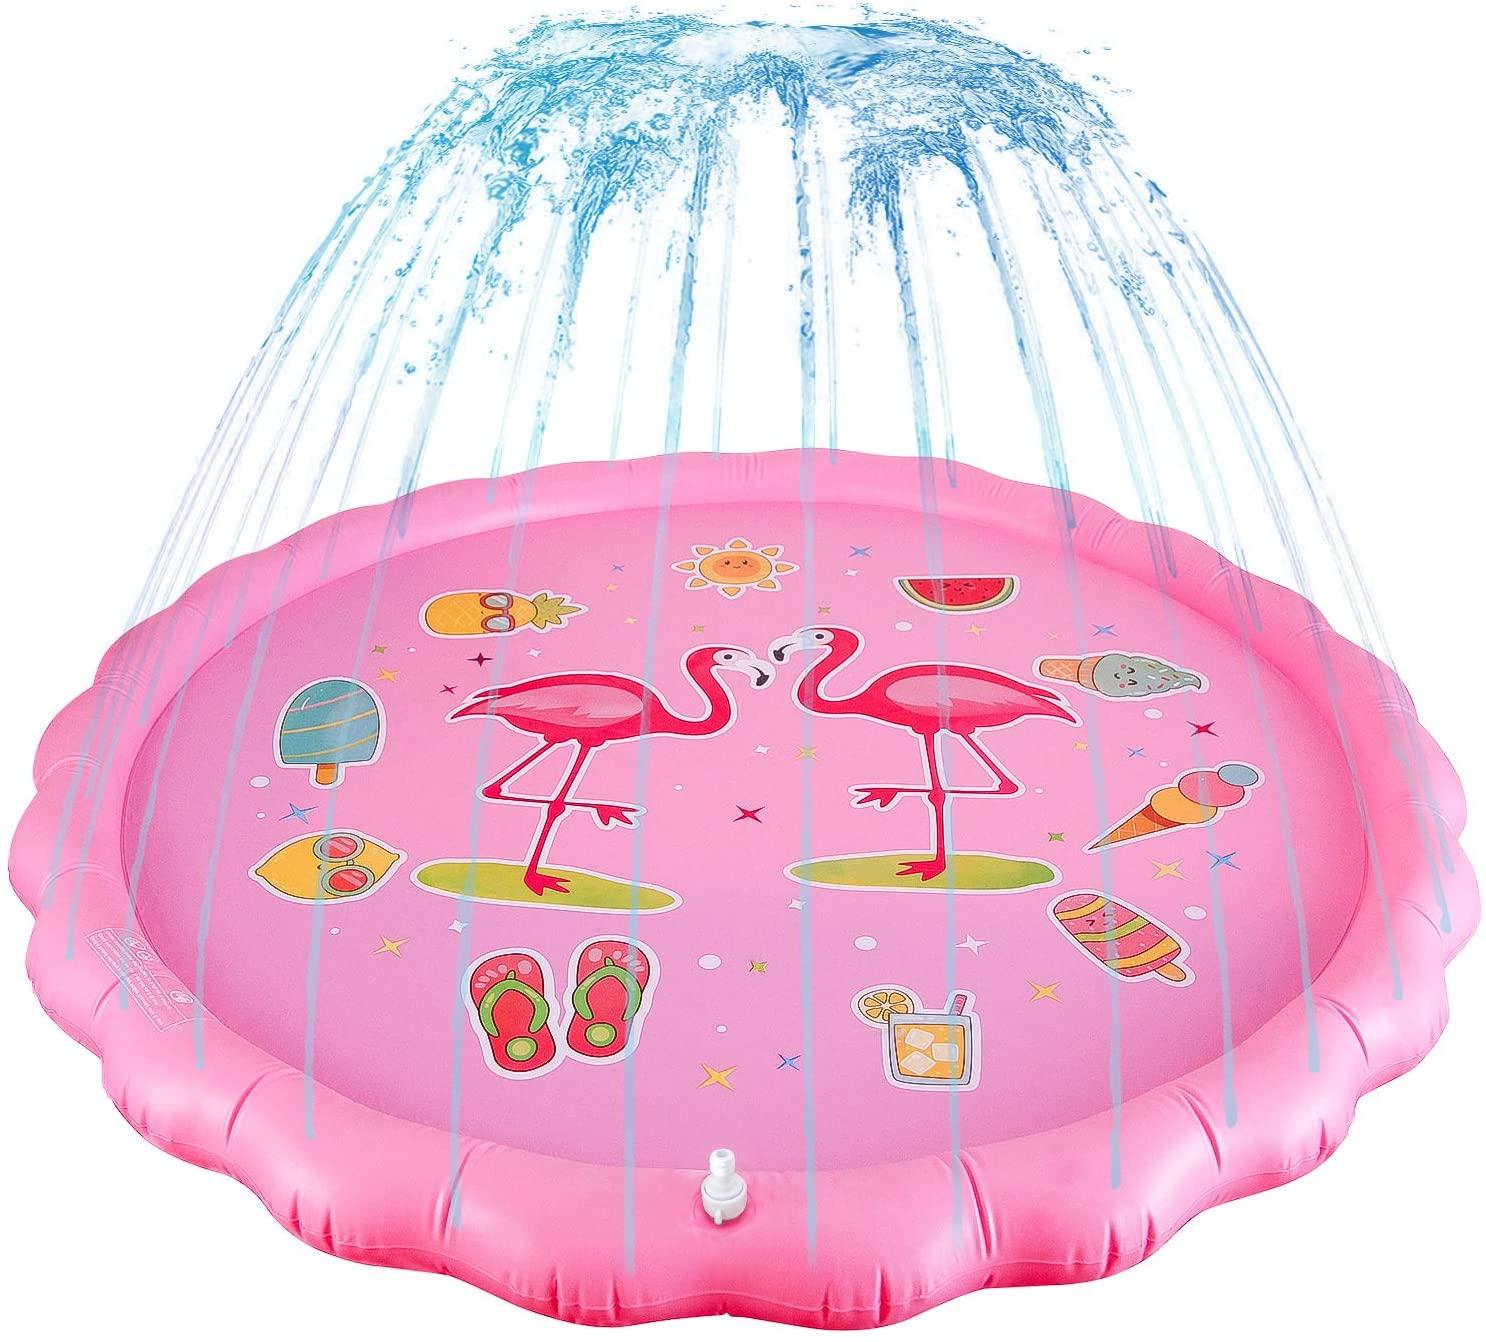 MissShorthair Summer Splash pad Large Water mat Outdoor Play Sprinkler for Kids